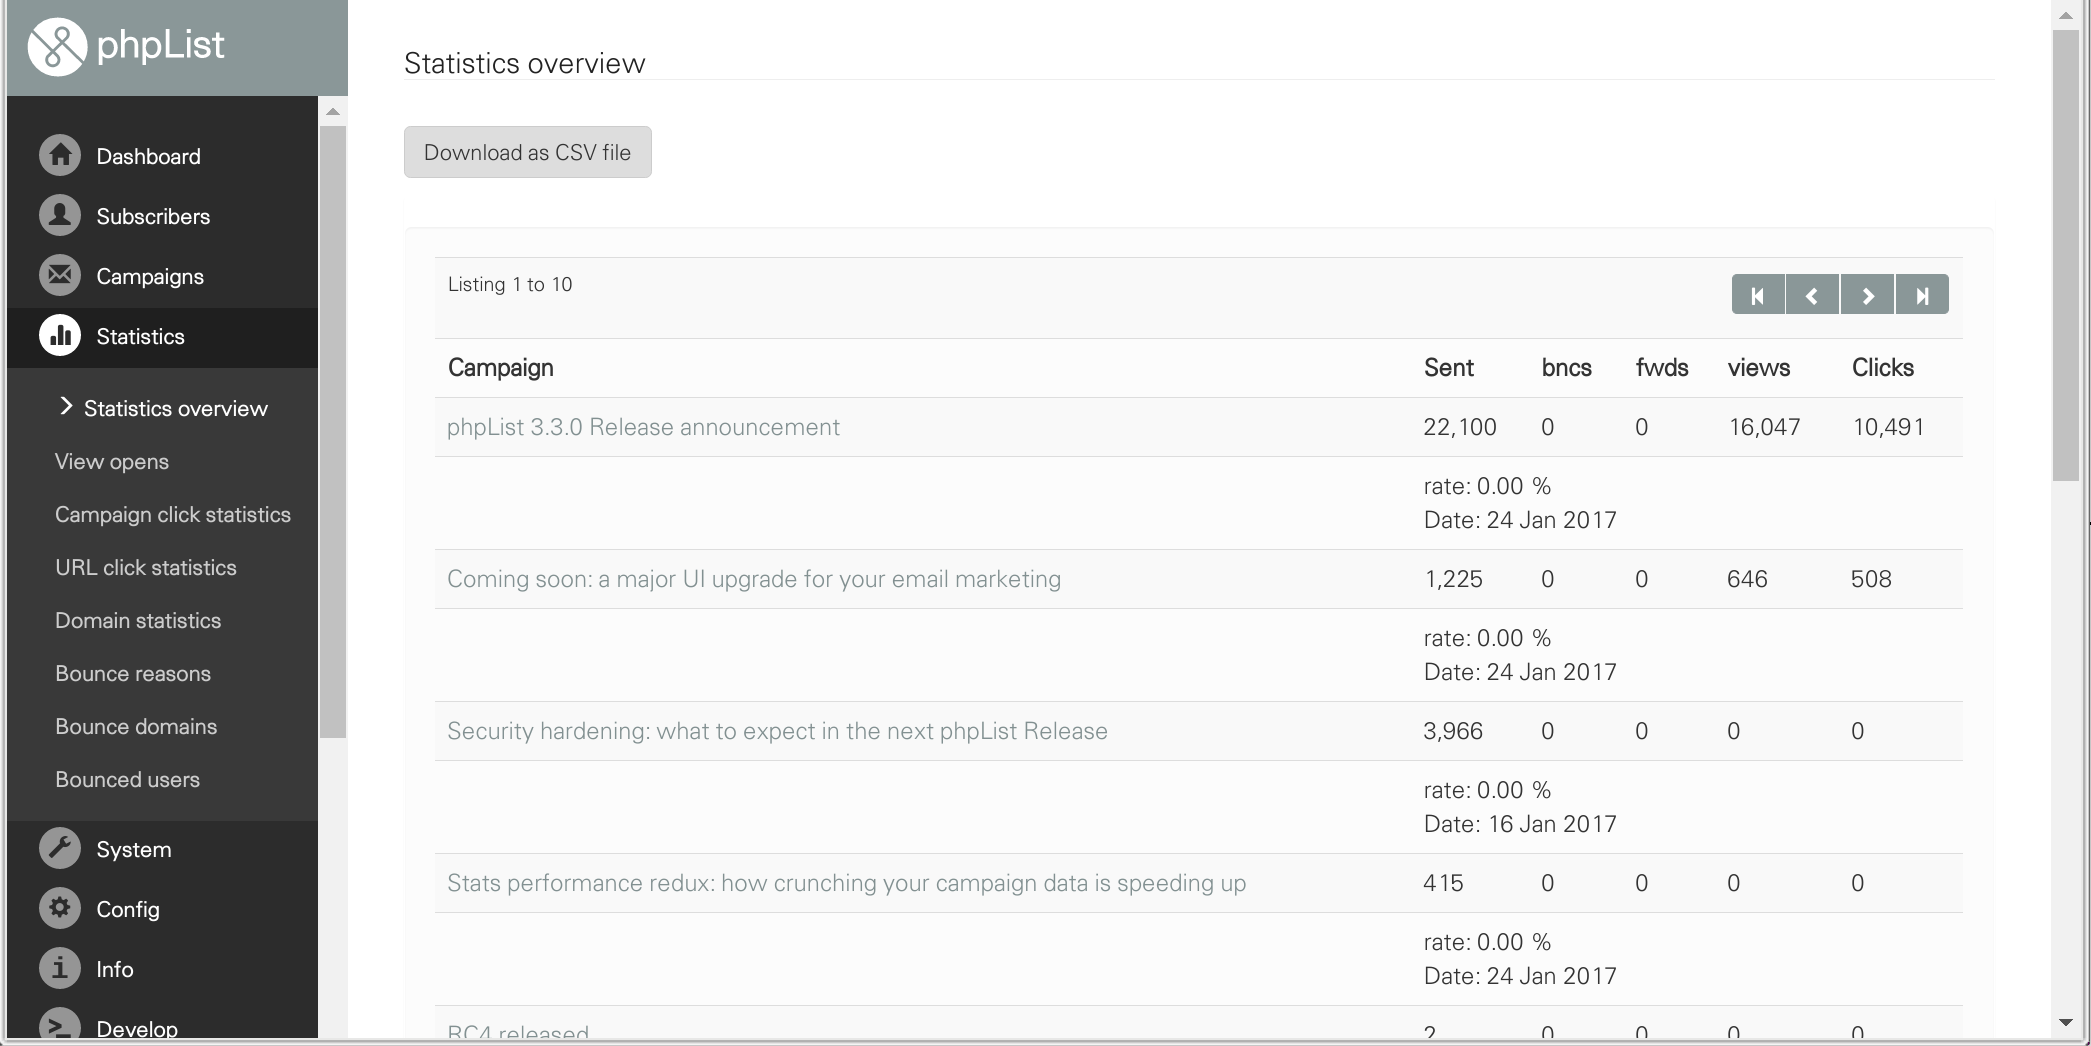 phplist-statistics-overview